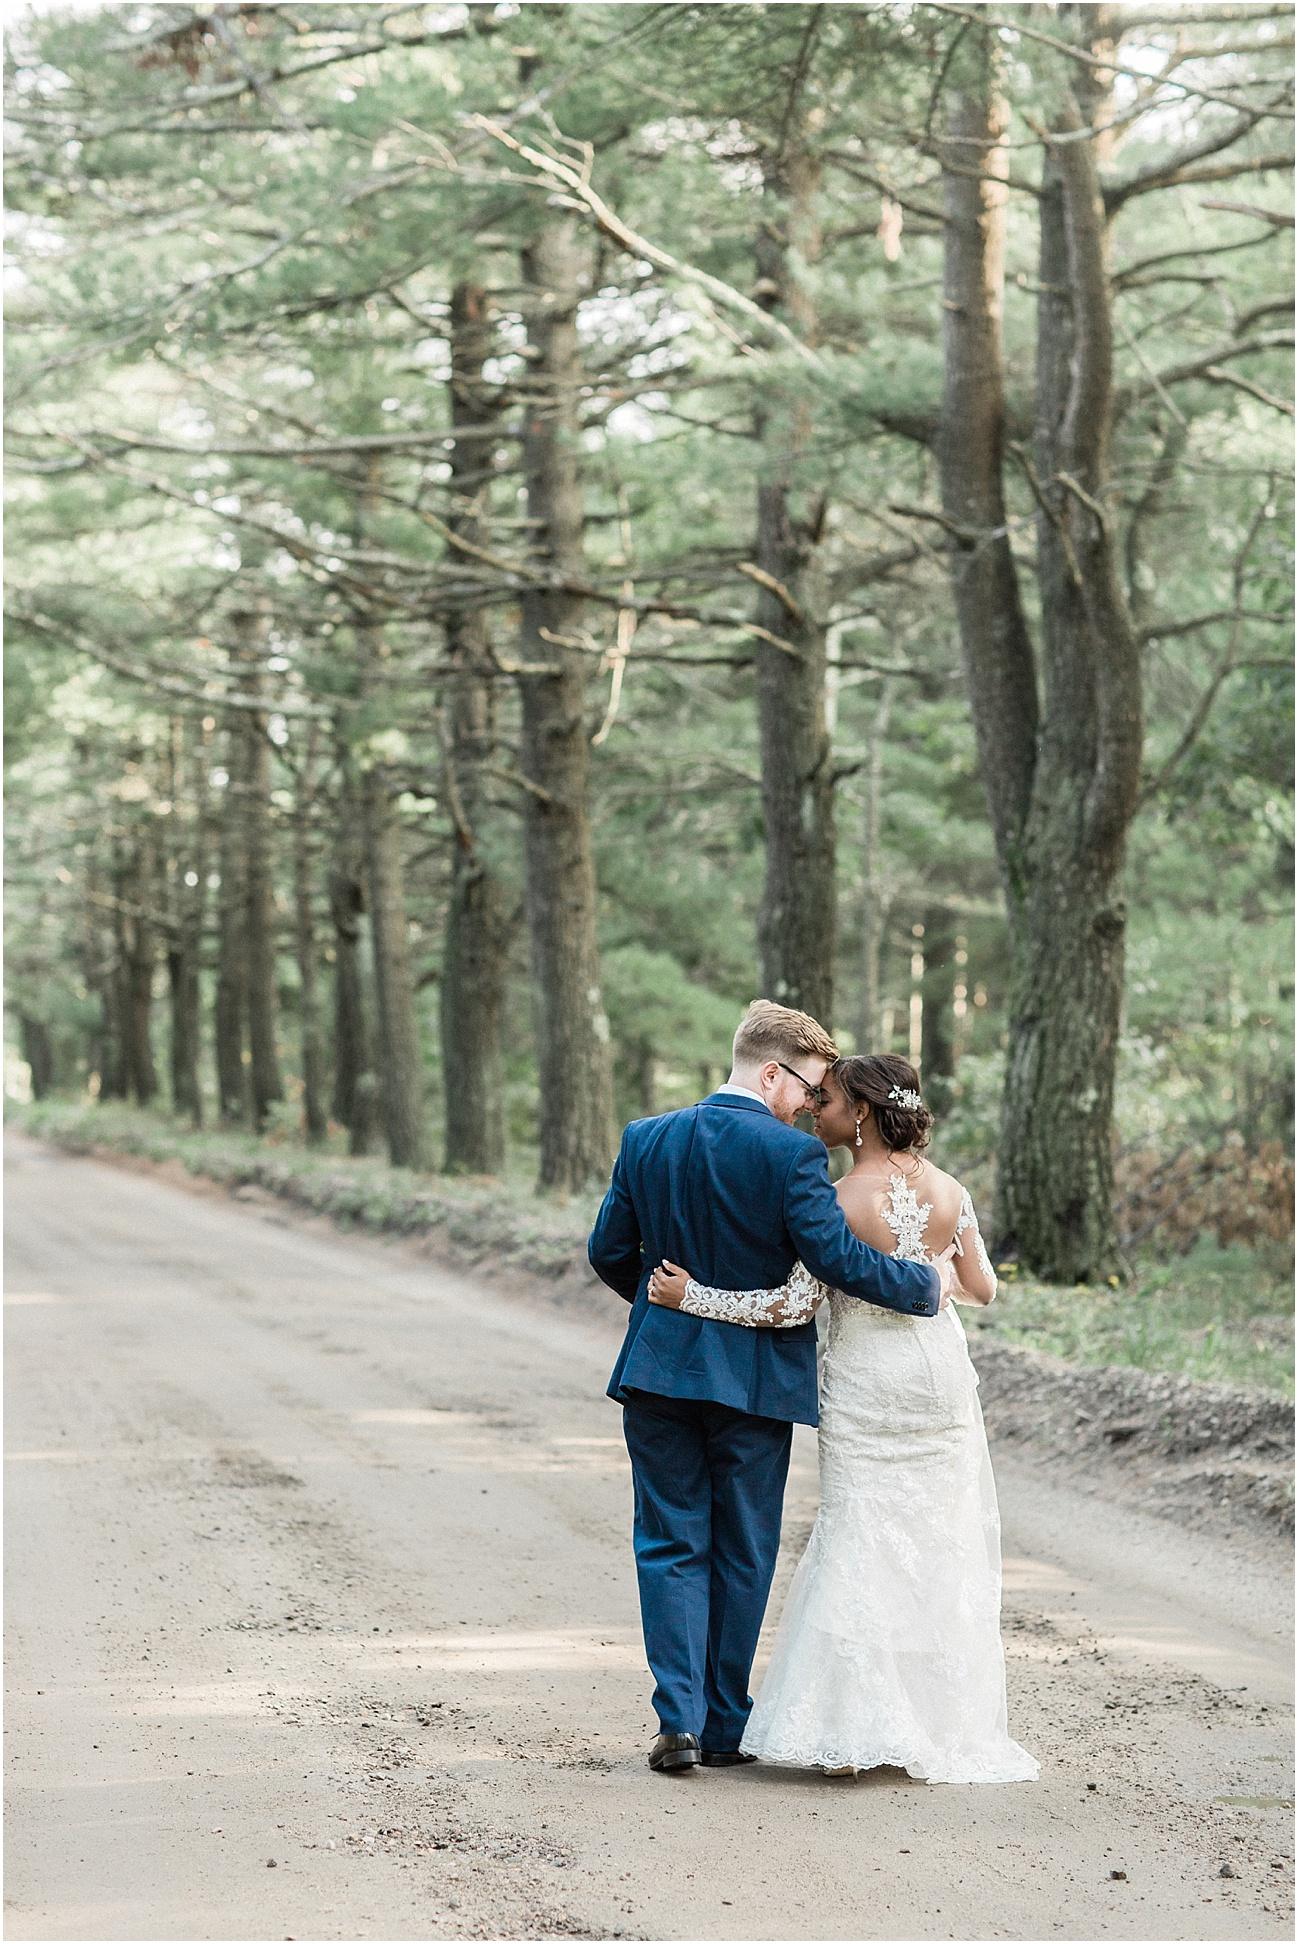 melissa_dan_the_pavilion_at_pine_hills_fall_wine_cape_cod_boston_wedding_photographer_meredith_jane_photography_photo_1190.jpg